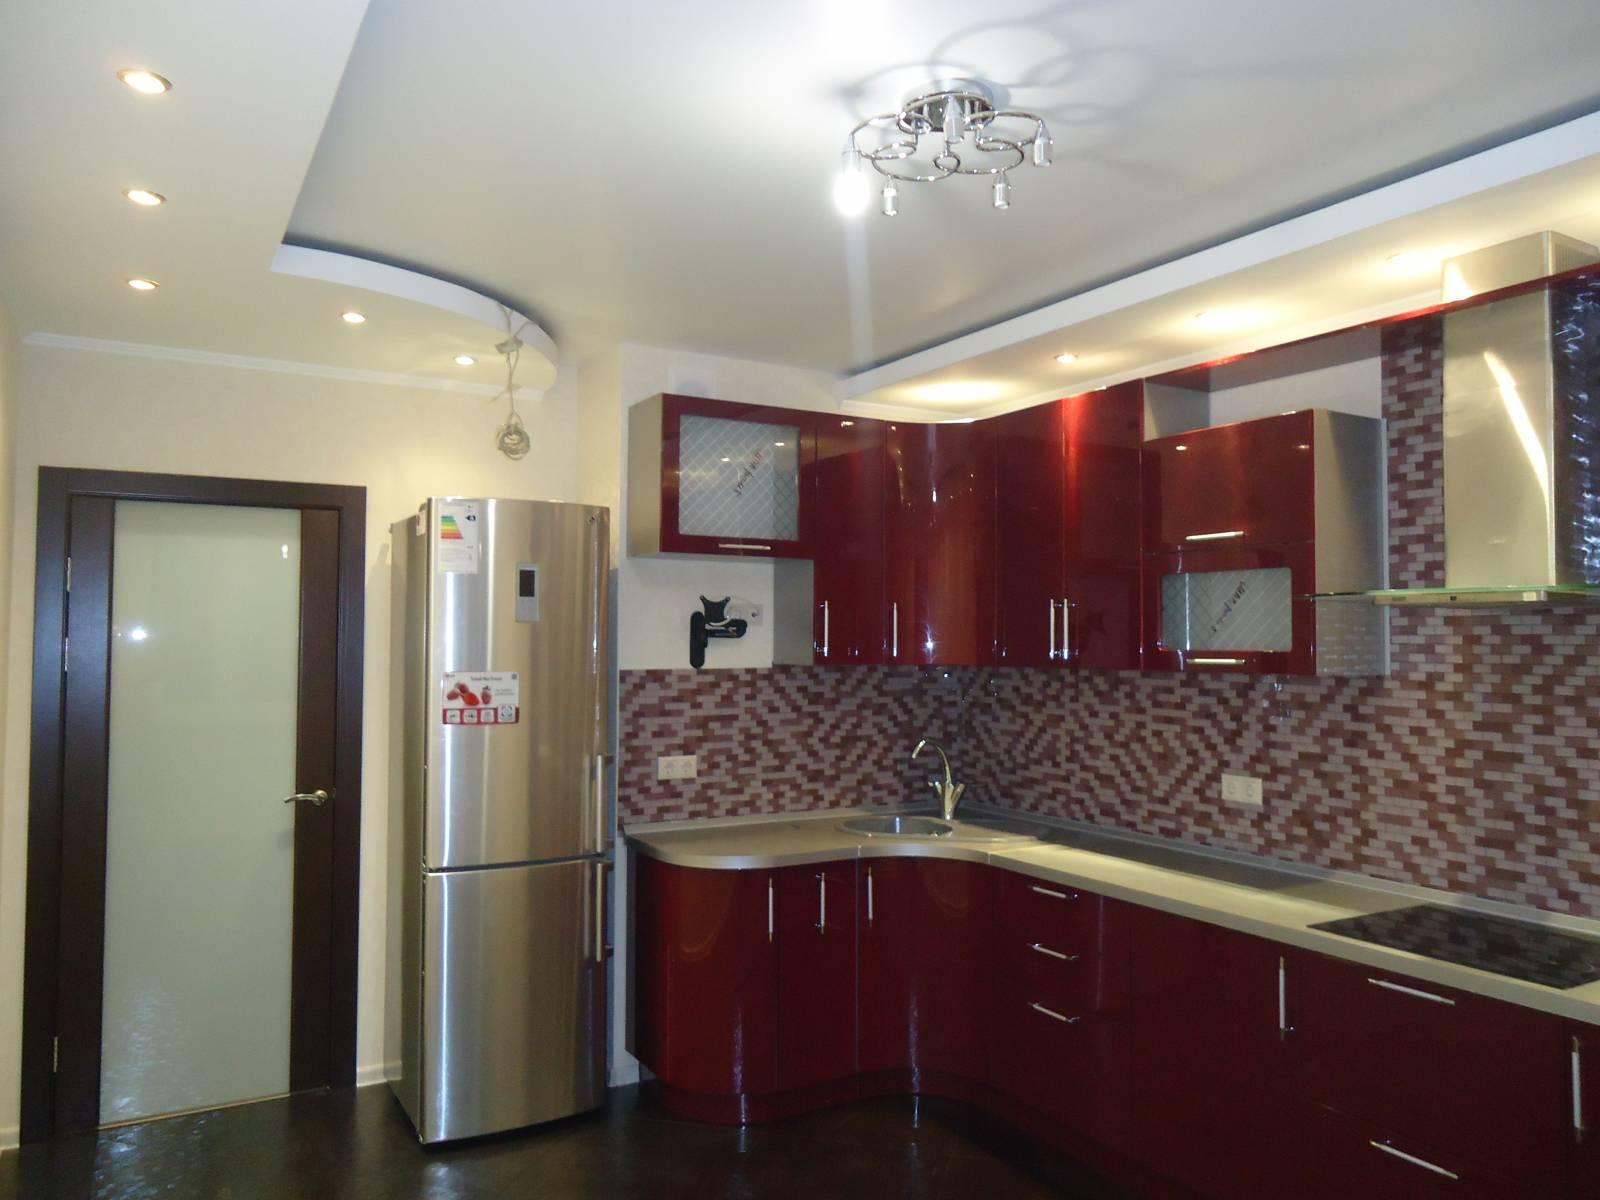 Кухня ремонт потолка своими руками фото